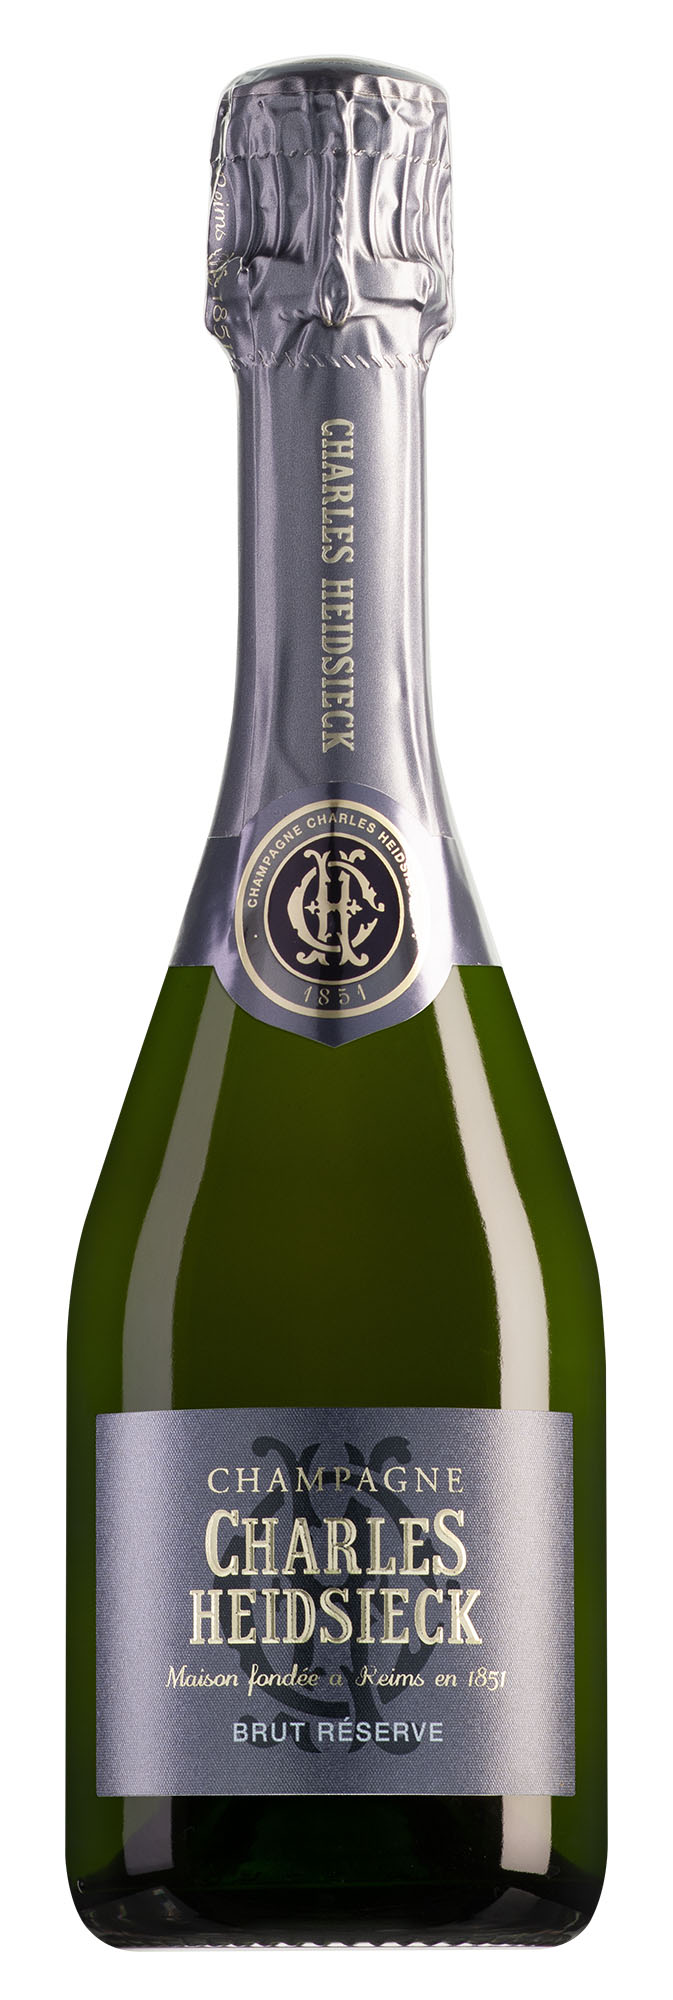 Charles Heidsieck Champagne Brut Réserve halve fles